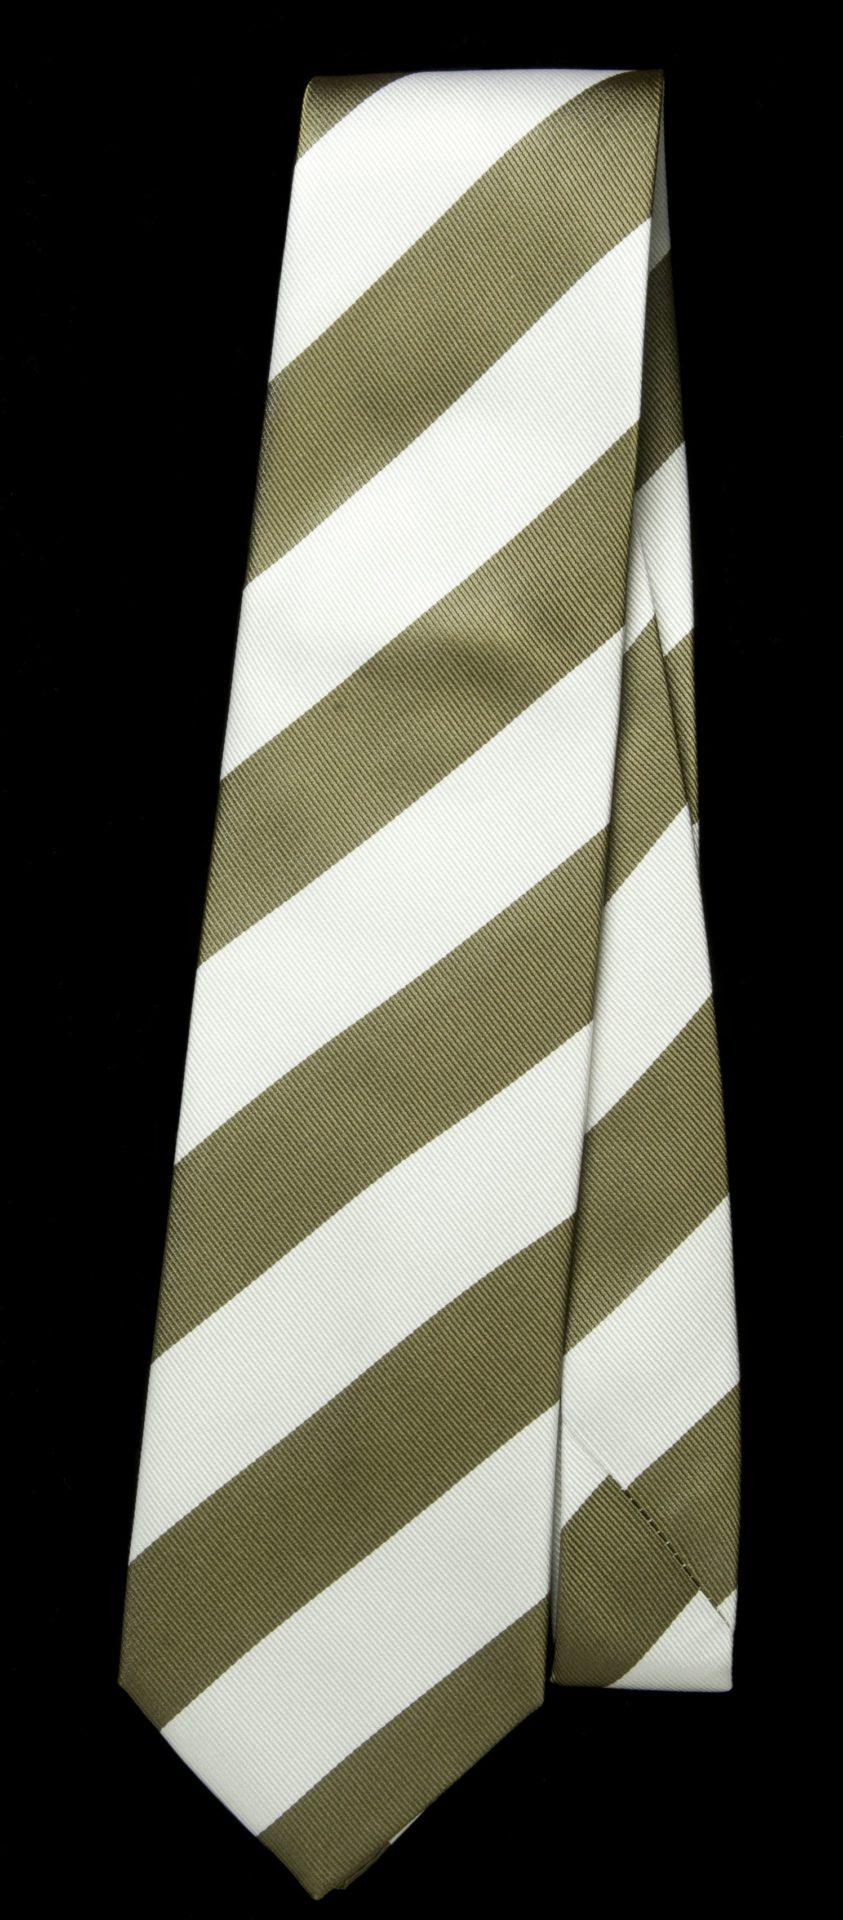 College Tie